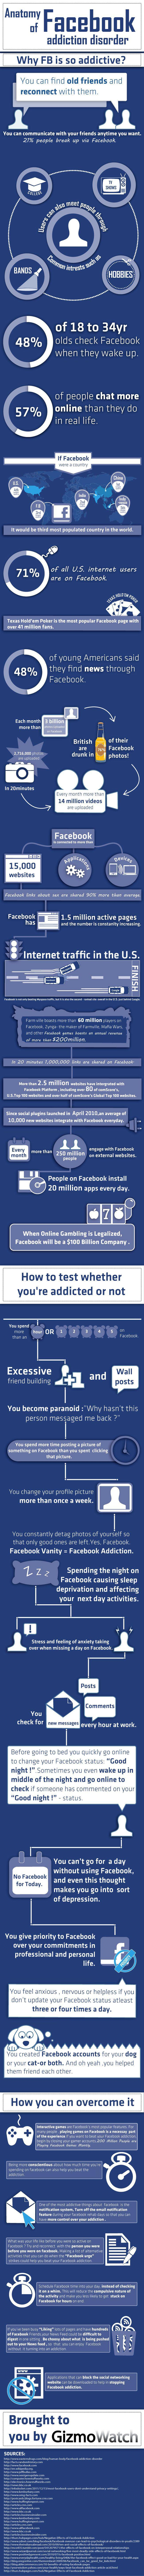 Anatomy of #Facebook addiction disorder: Media Infographics, Infographic Socialmedia, Infografia Infographic, Anatomy, Facebook Addiction, Social Media, Disorders